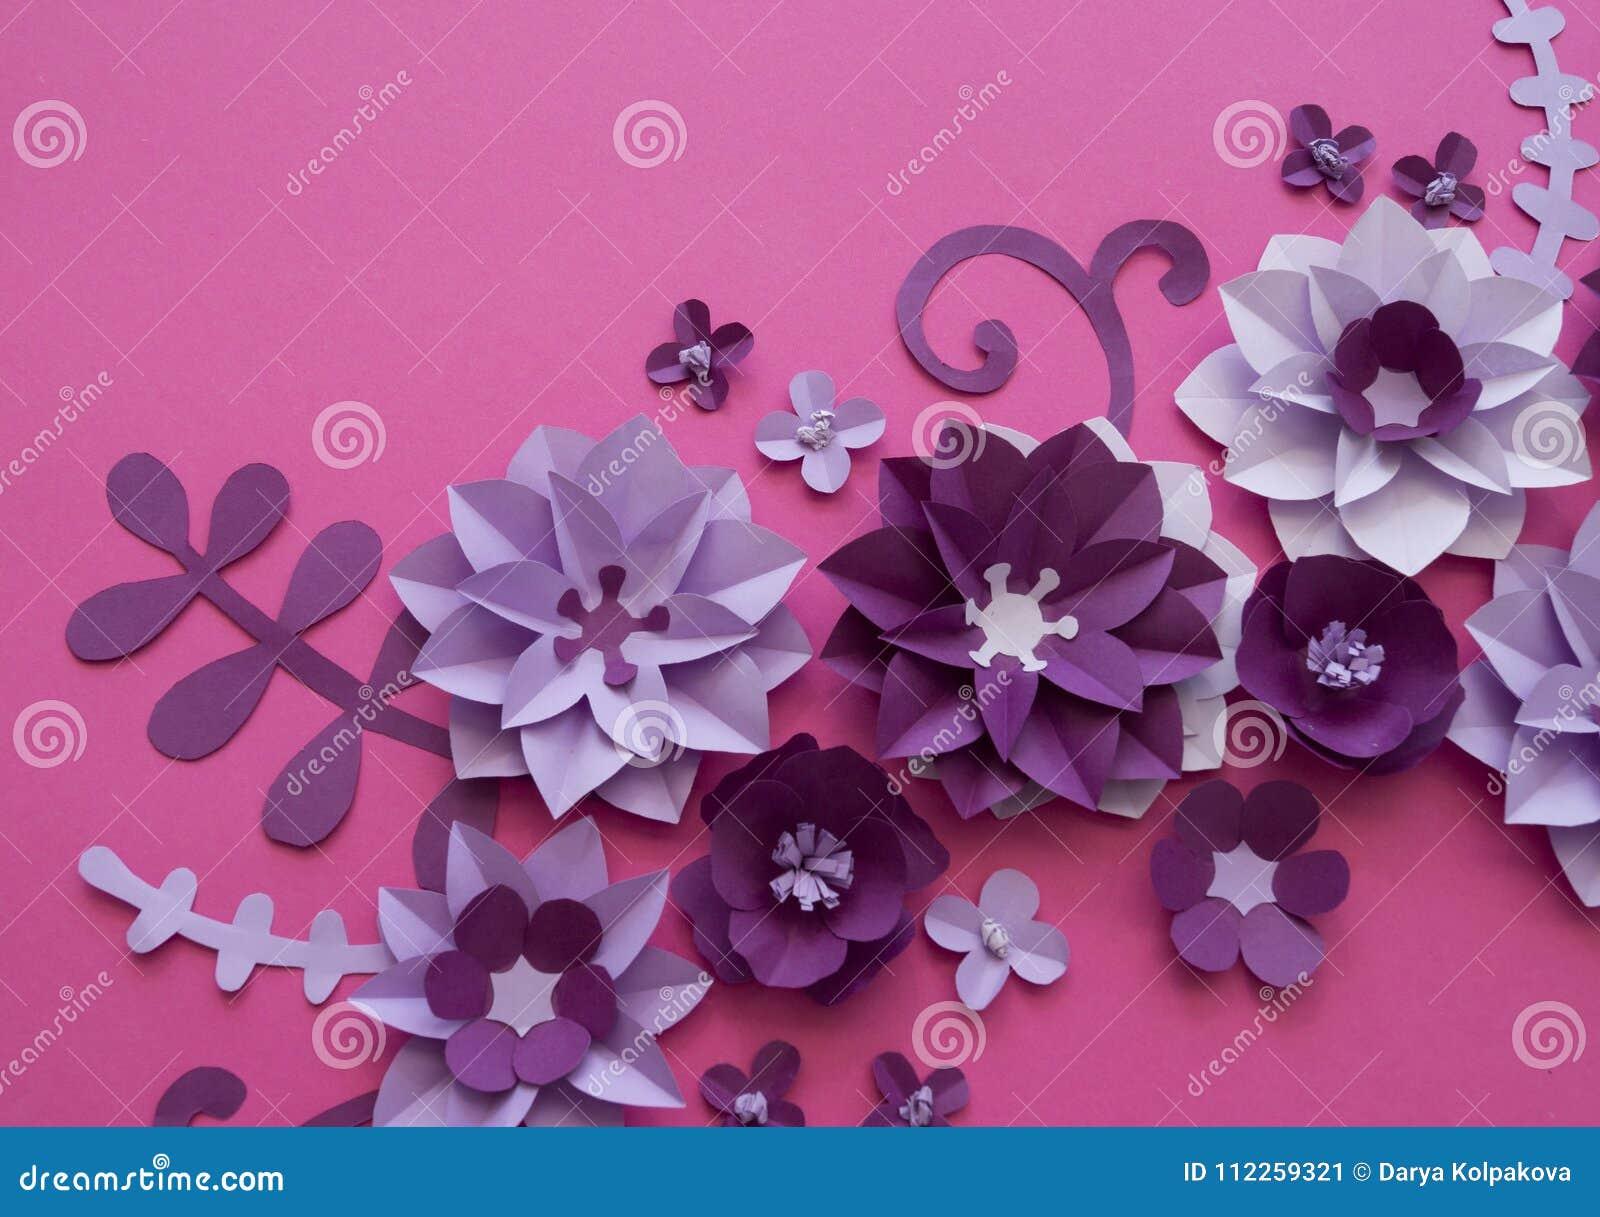 Flower Plant Floral Nature Designs Stock Image Image Of Frame